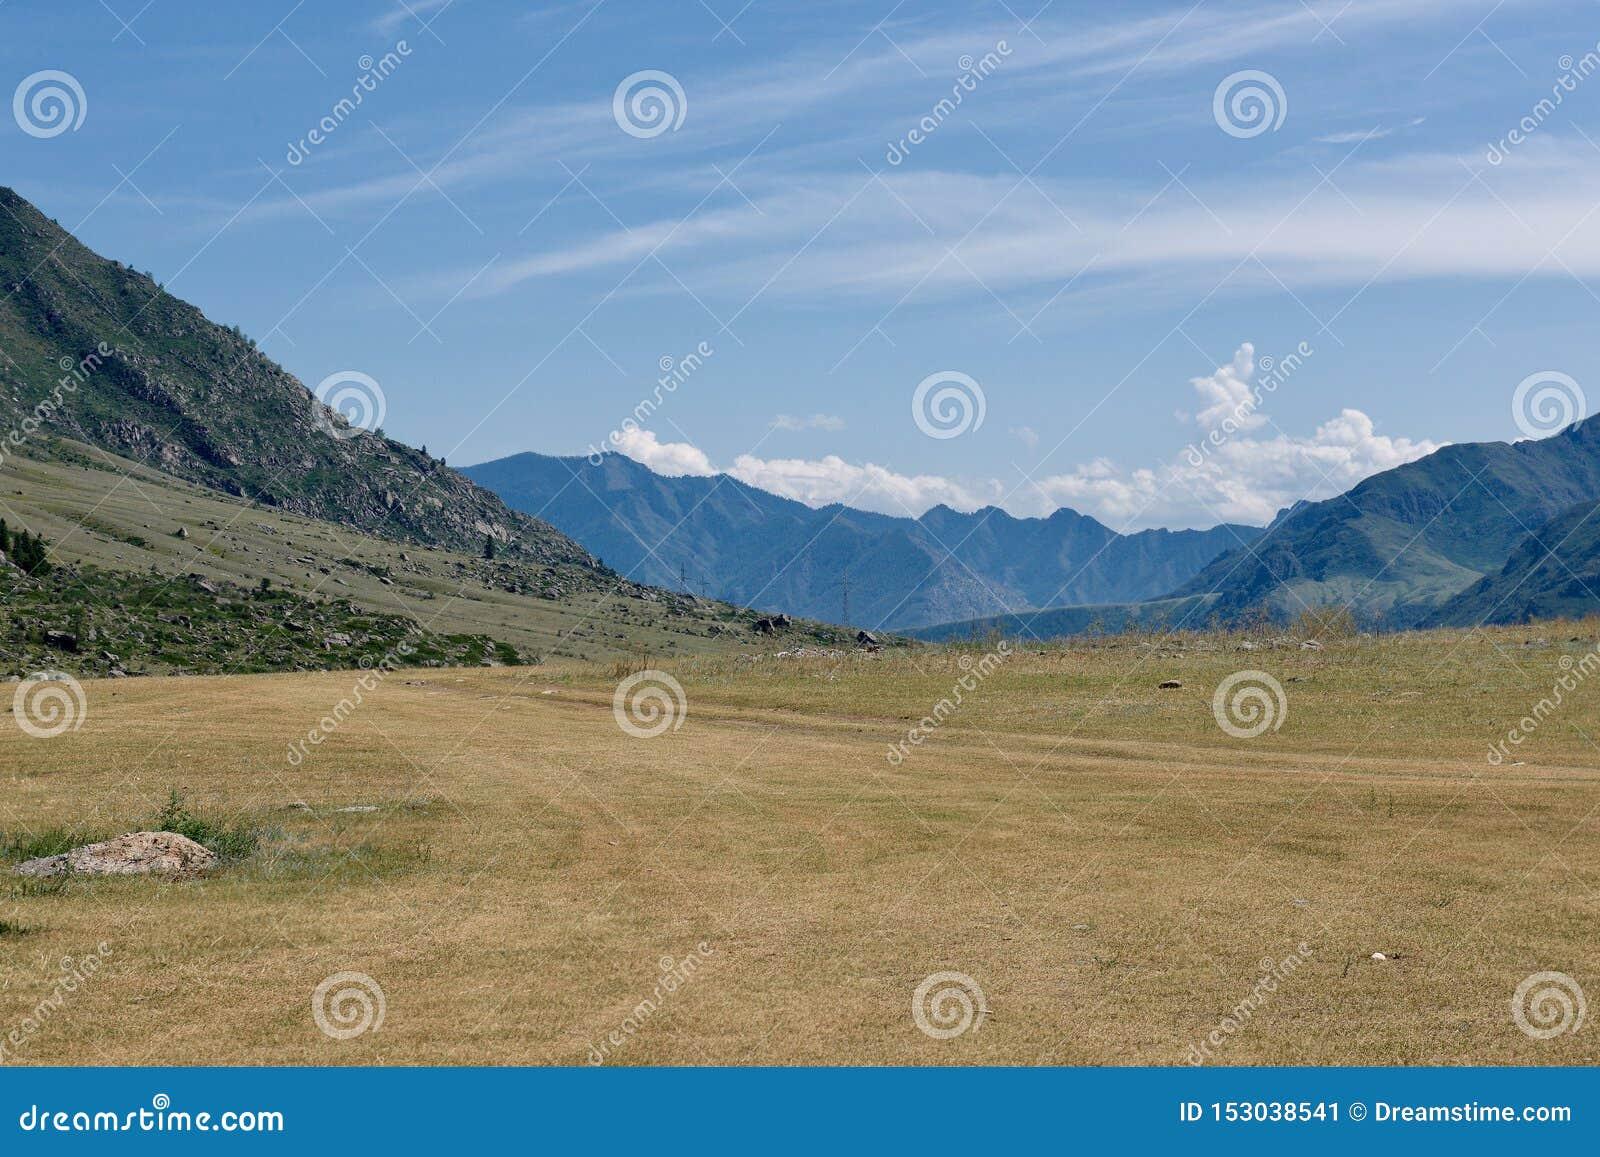 Gorny Altai, Siberië, Russische Federatie